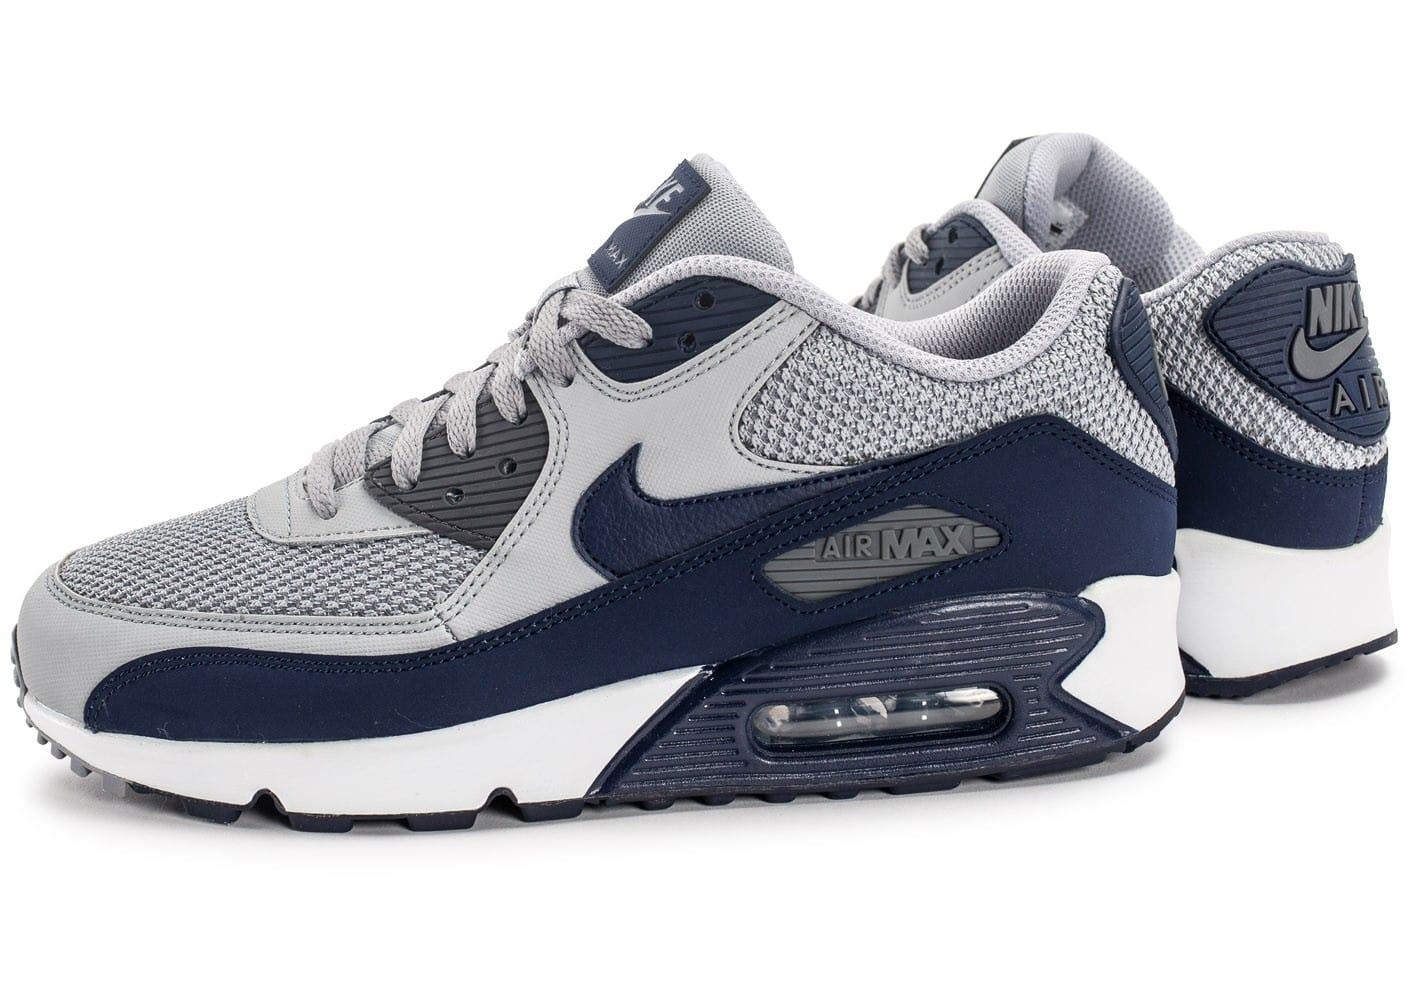 b8b8f46becc002 Achat De ve Nike Air Max 90 Homme Bleu Chaussures Pas Cher Alainhemet